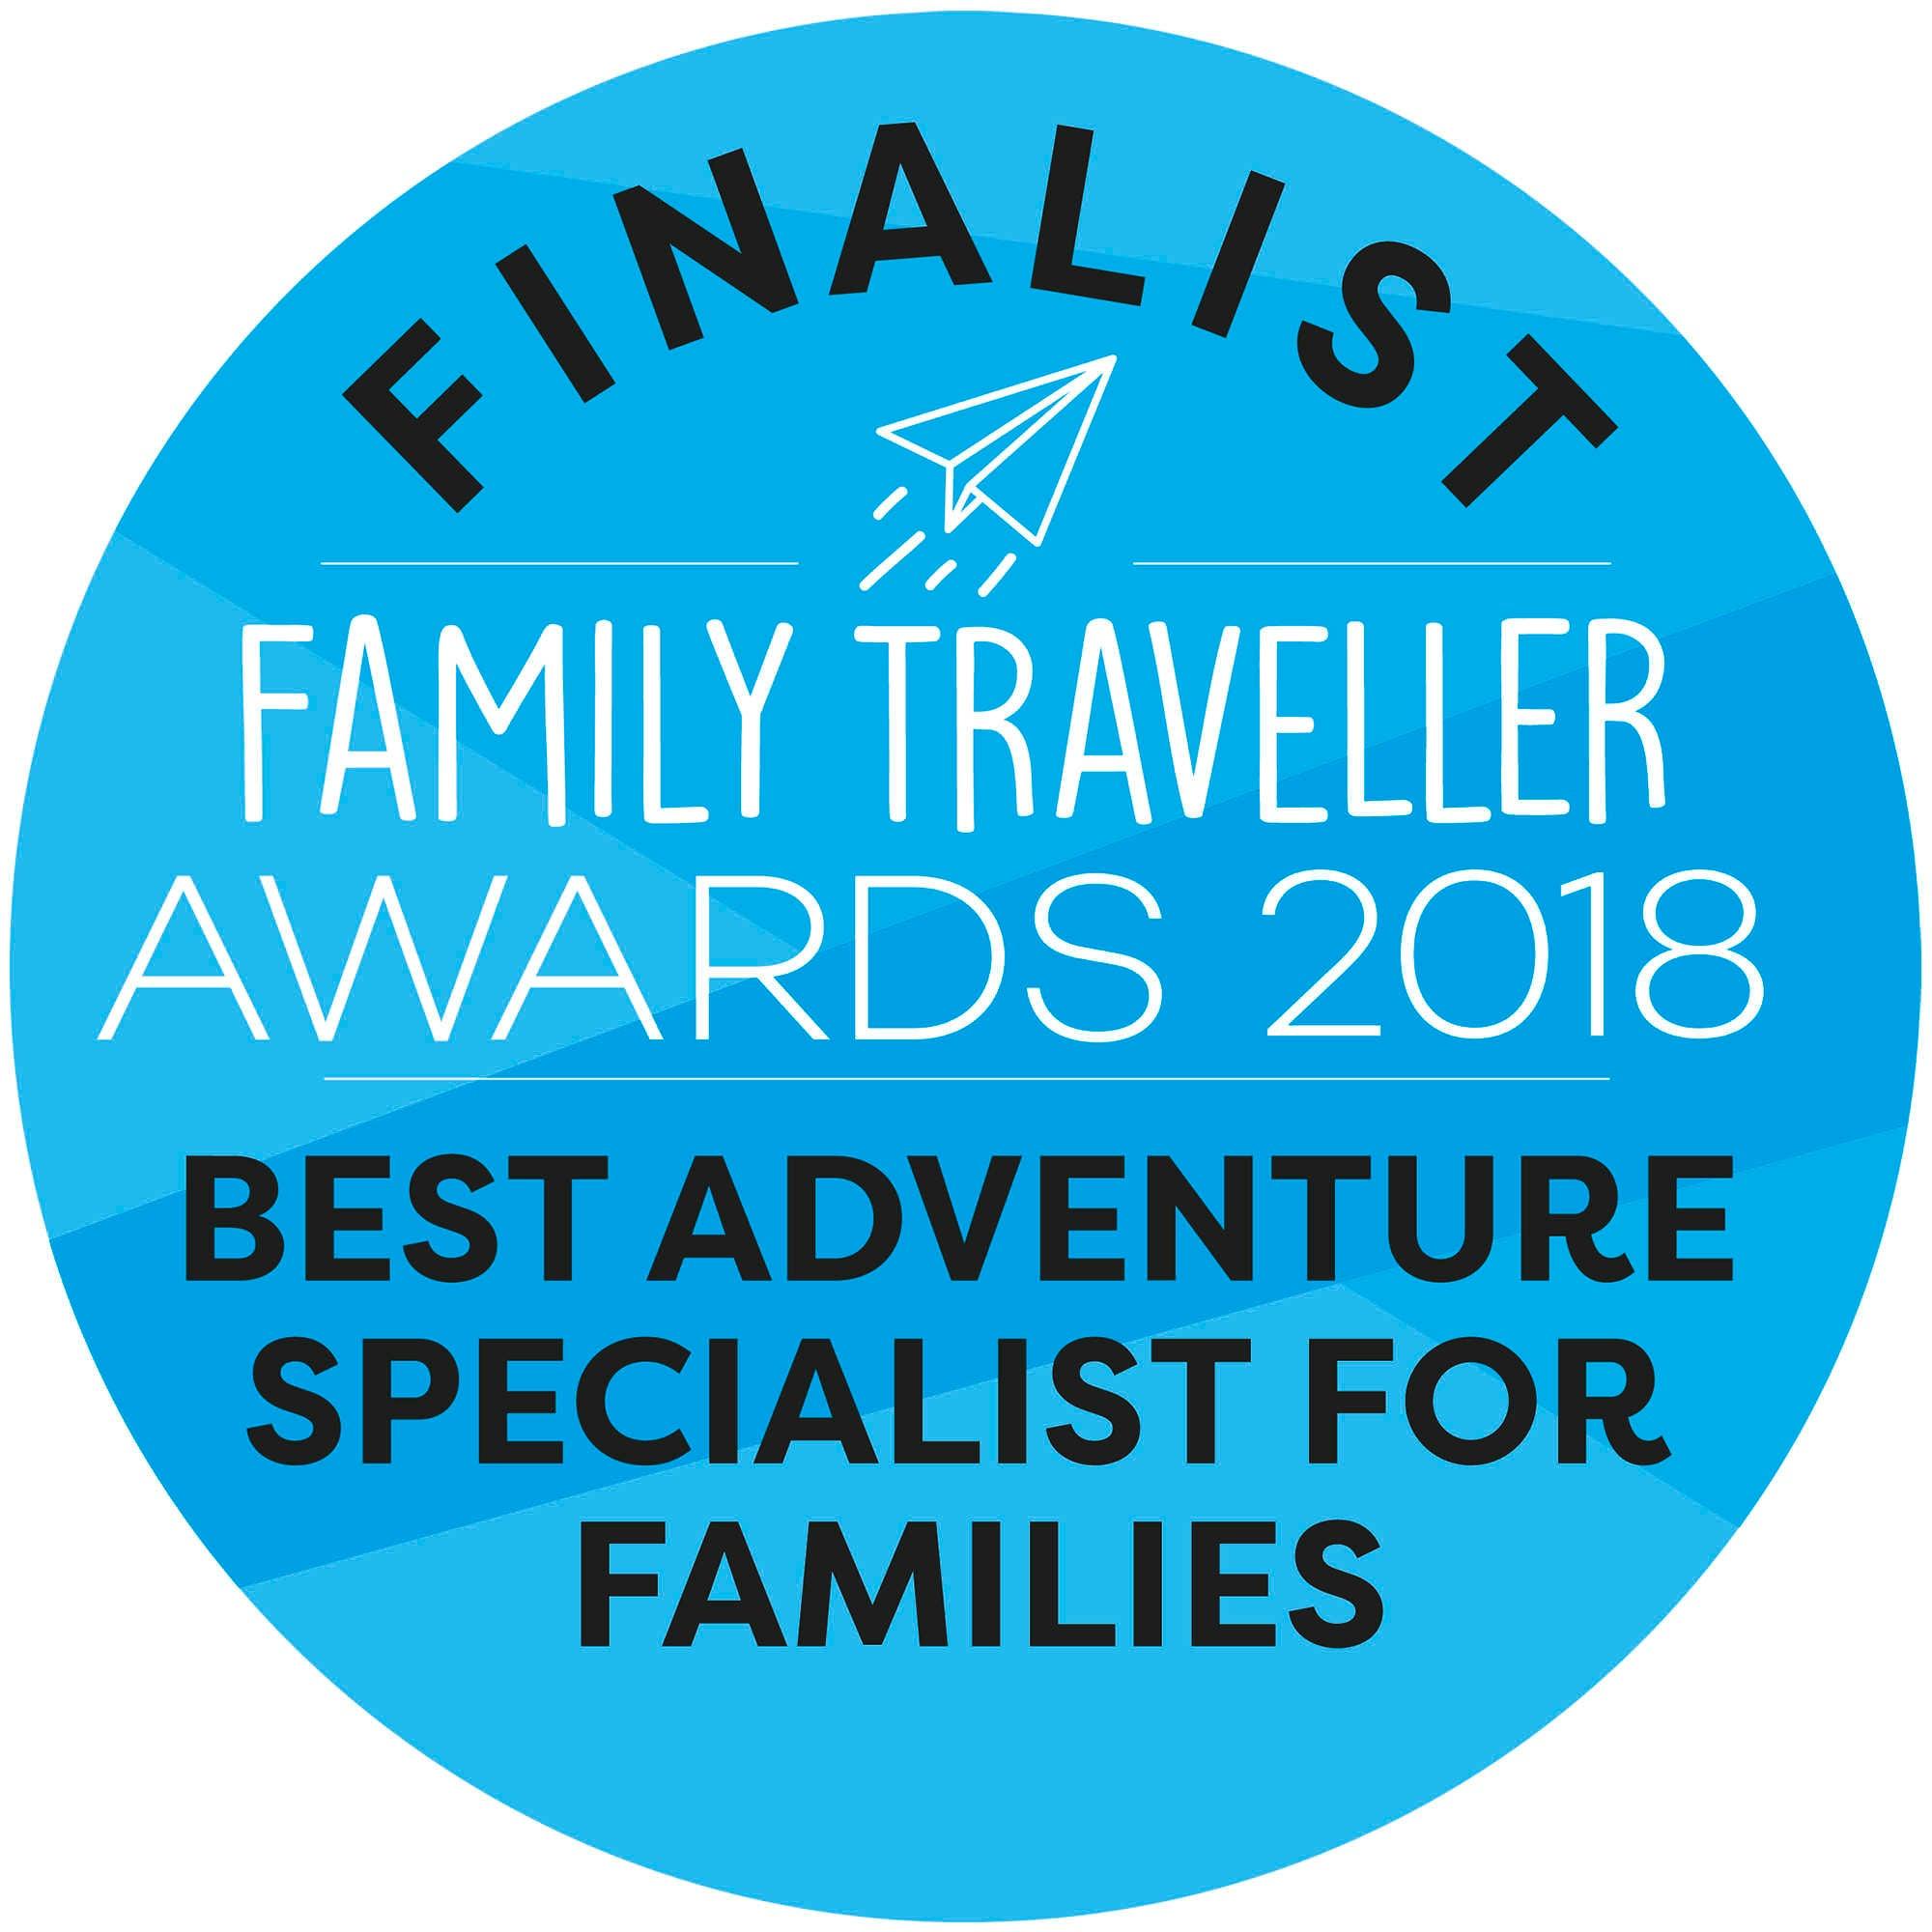 Exodus Nominated in Family Traveller Awards